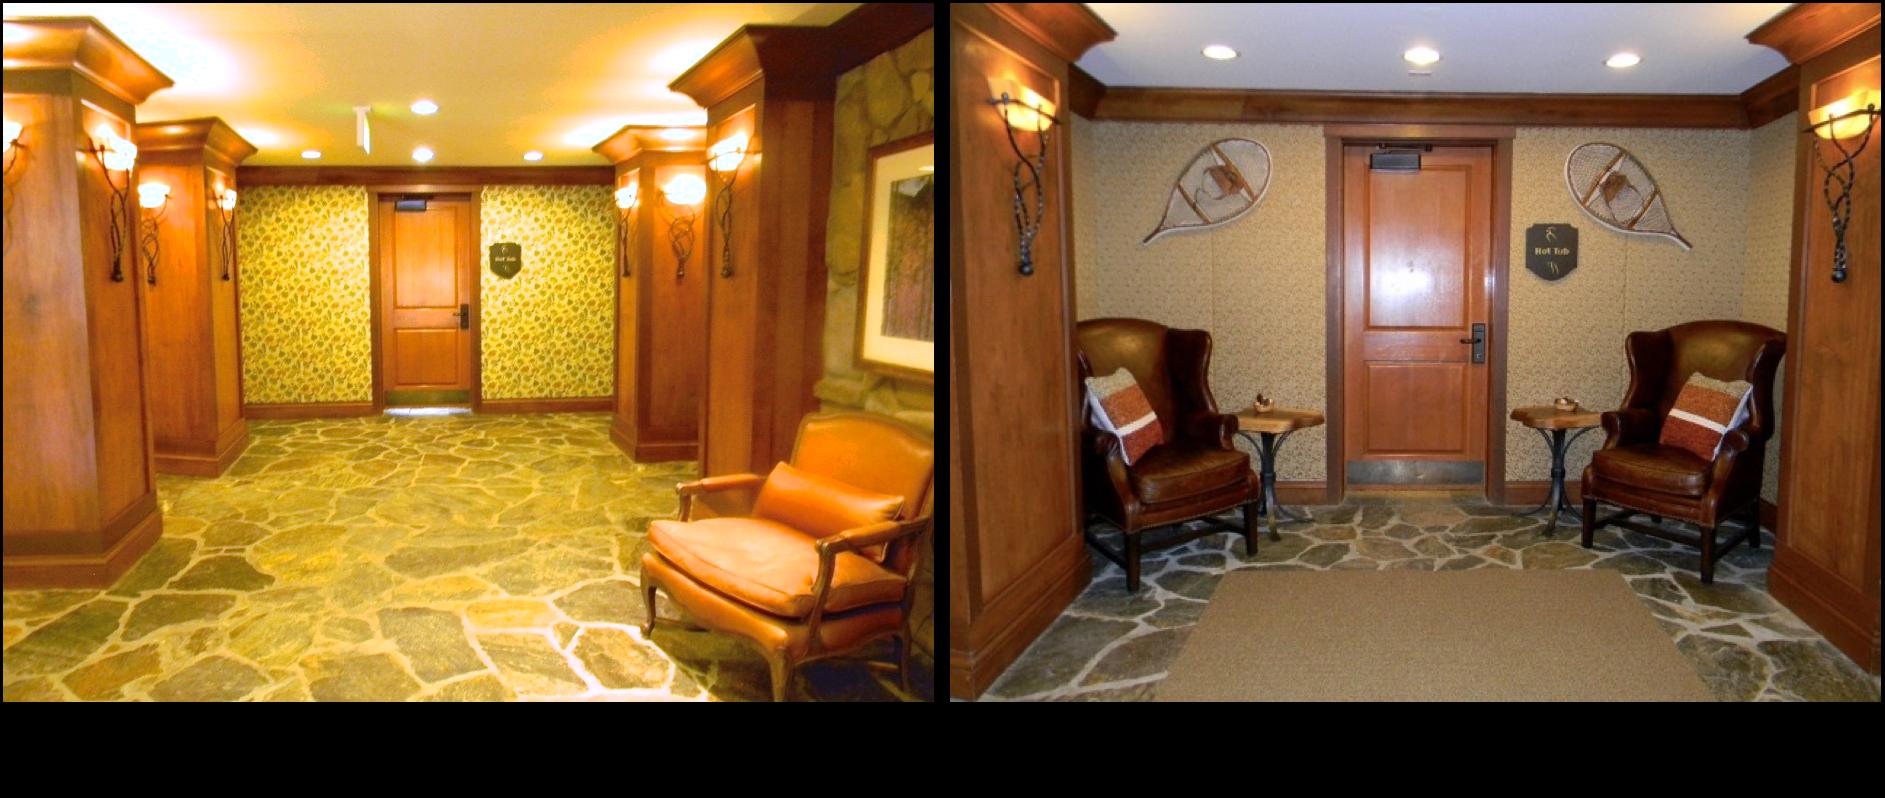 Mountain resort lobby jda interior design llc for A r interior decoration llc